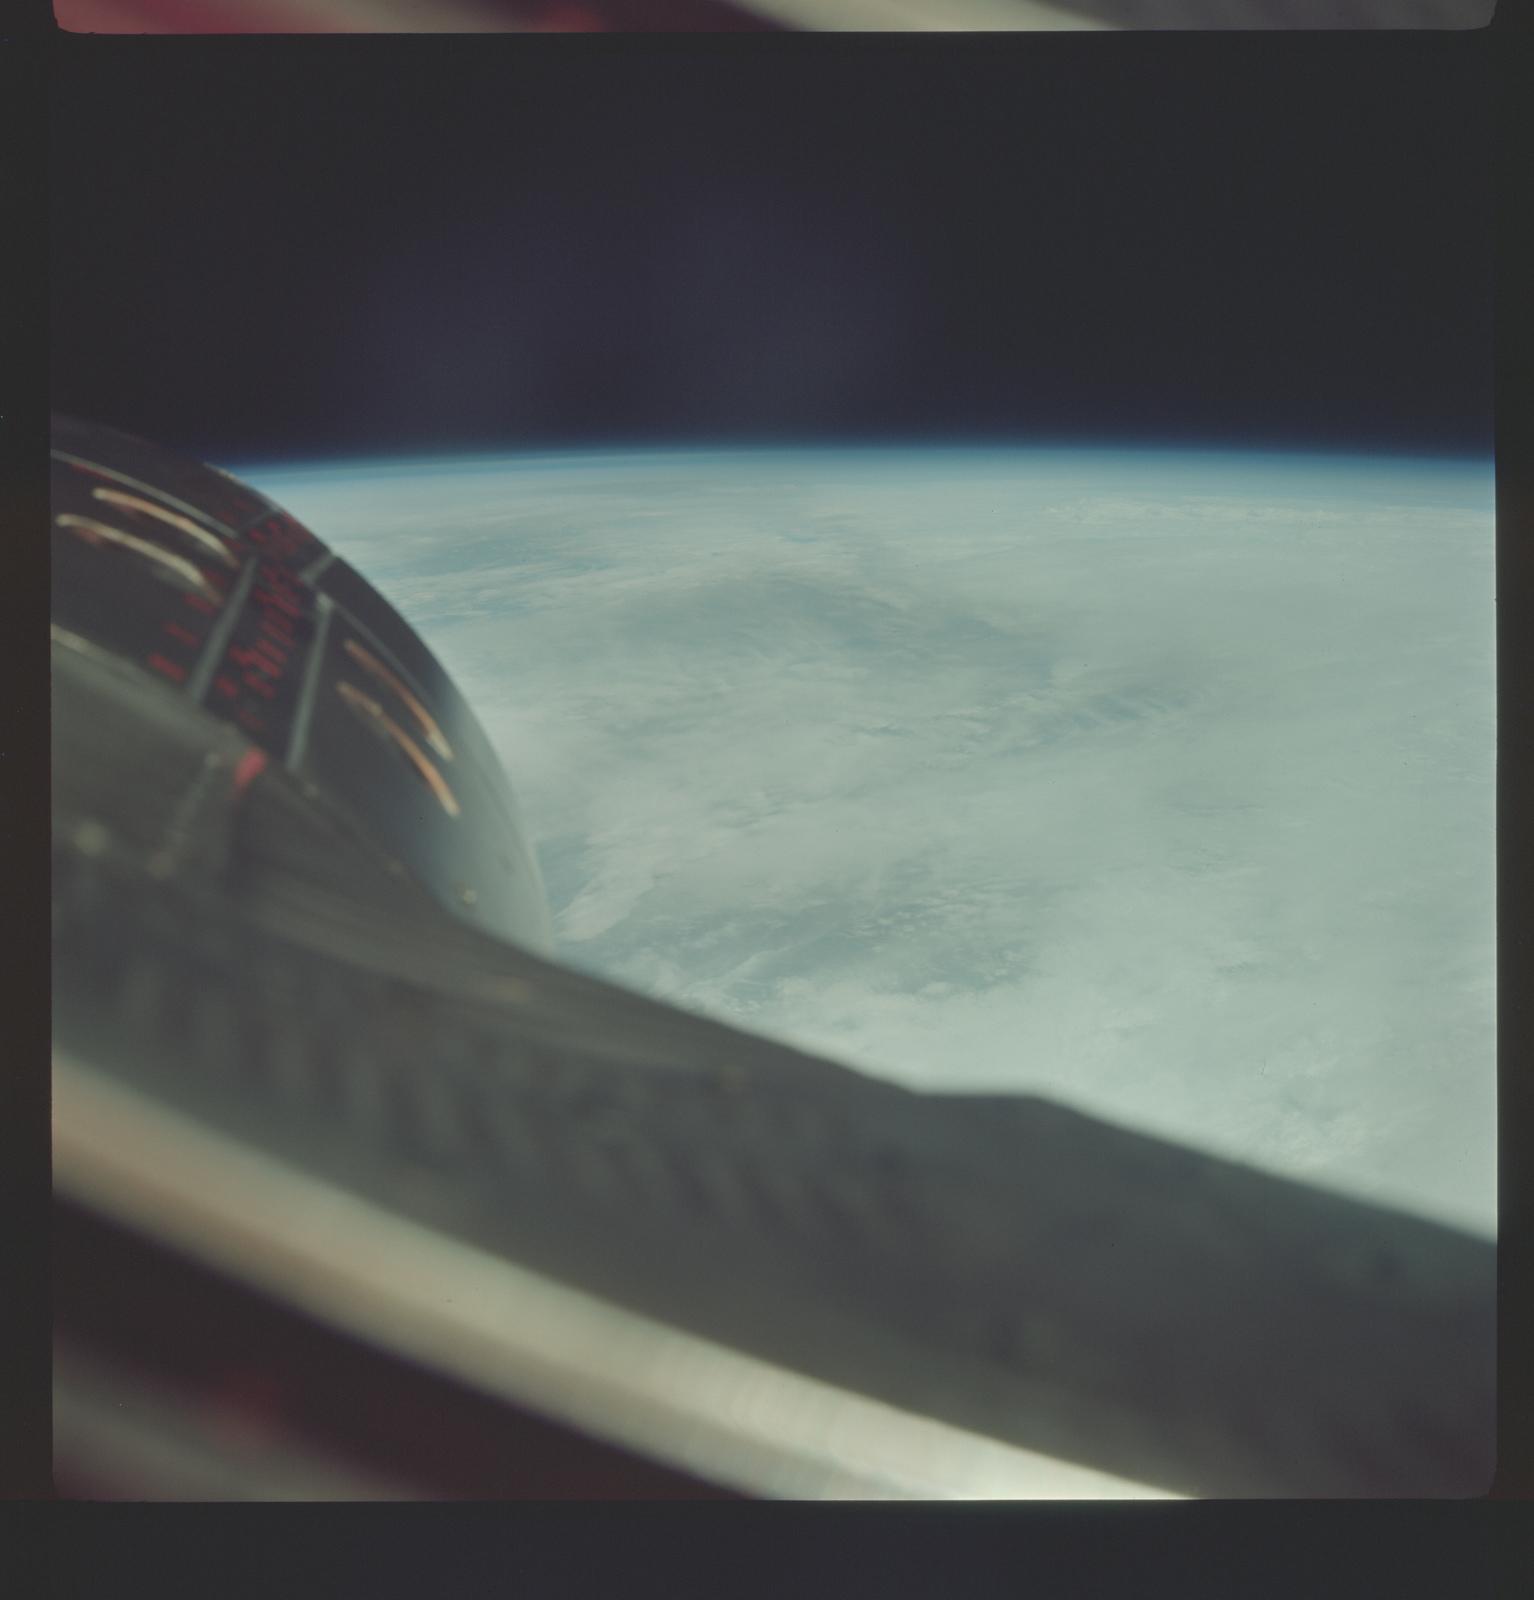 Gemini III Mission Image - southeastern Africa